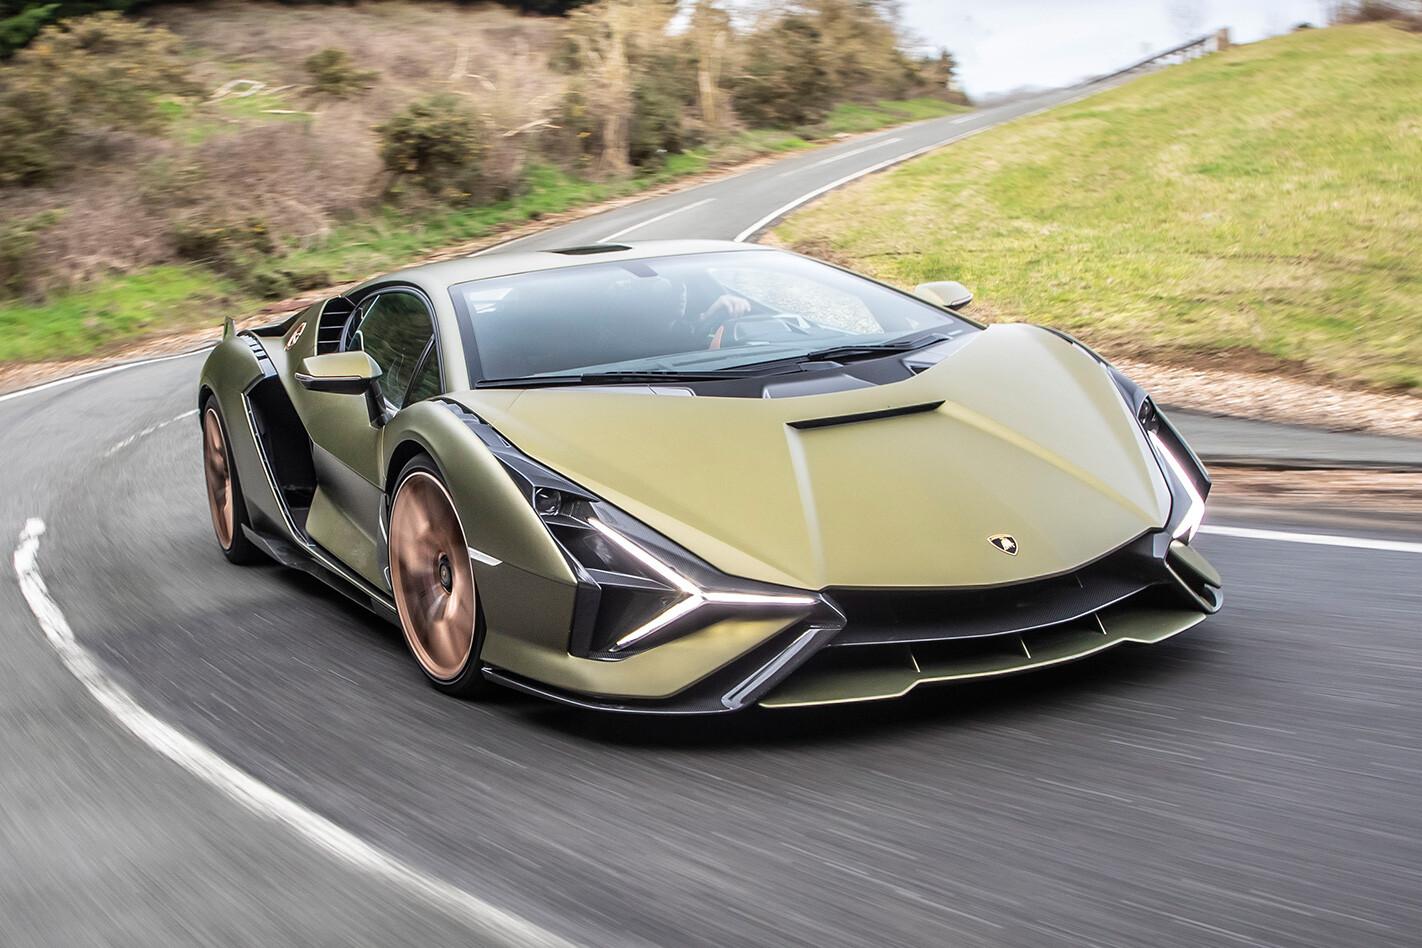 2021 Lamborghini Sian First Drive Review